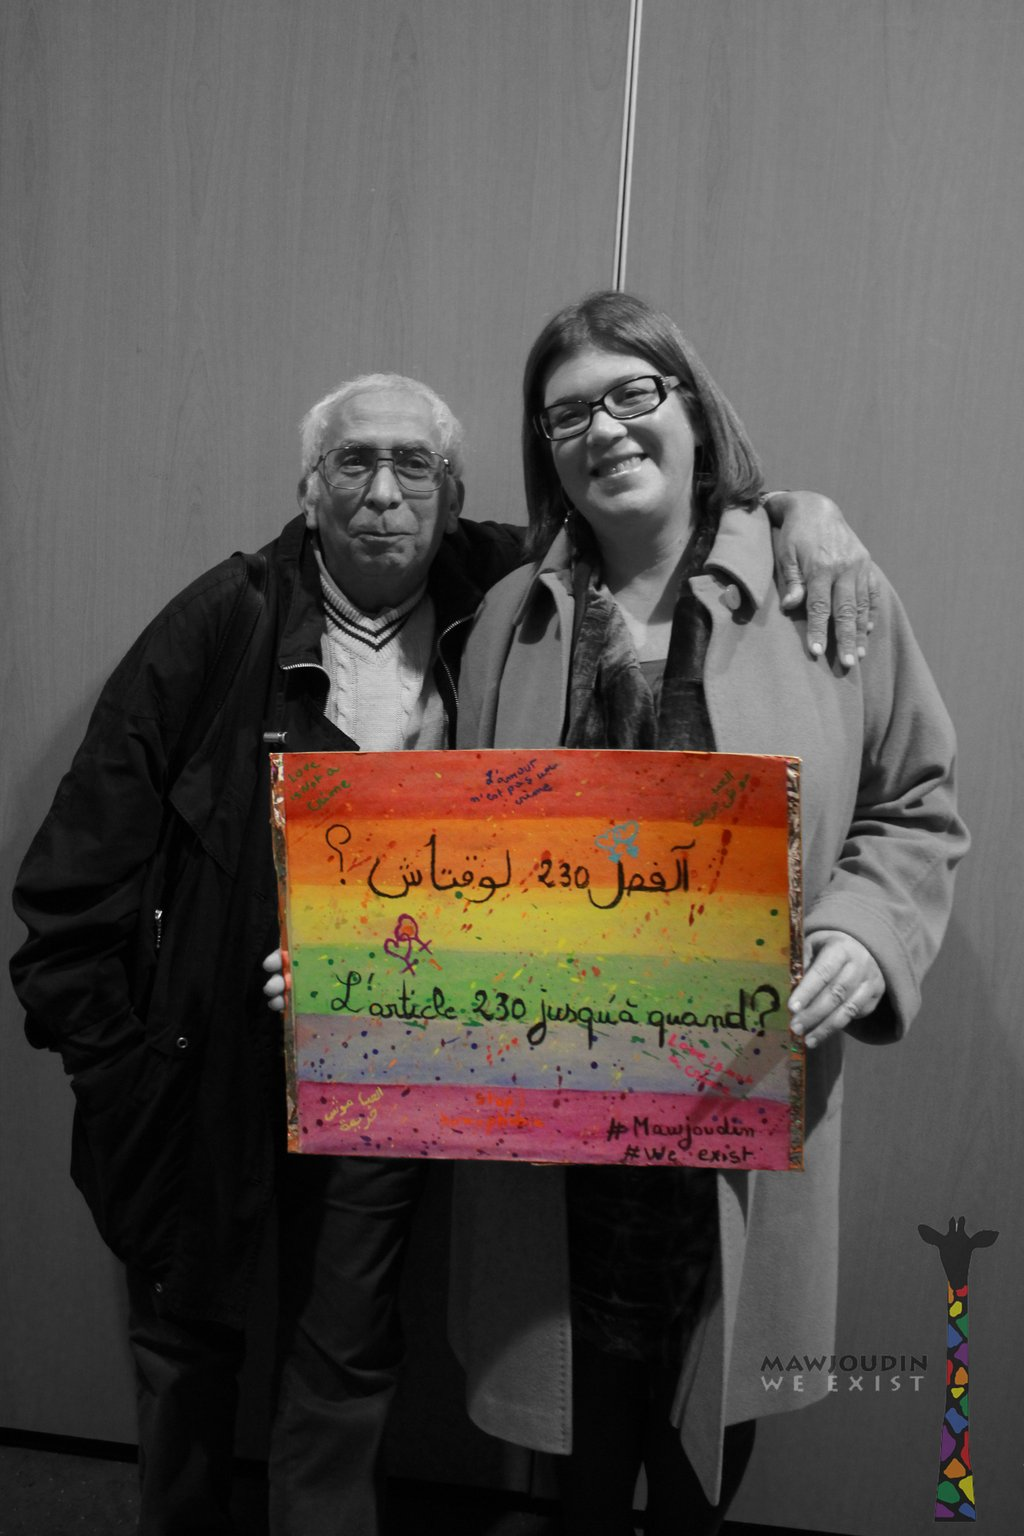 Faten abdelkafi et taoufik karkar - Tunisian Celebrities Demand More Rights for Homosexuals